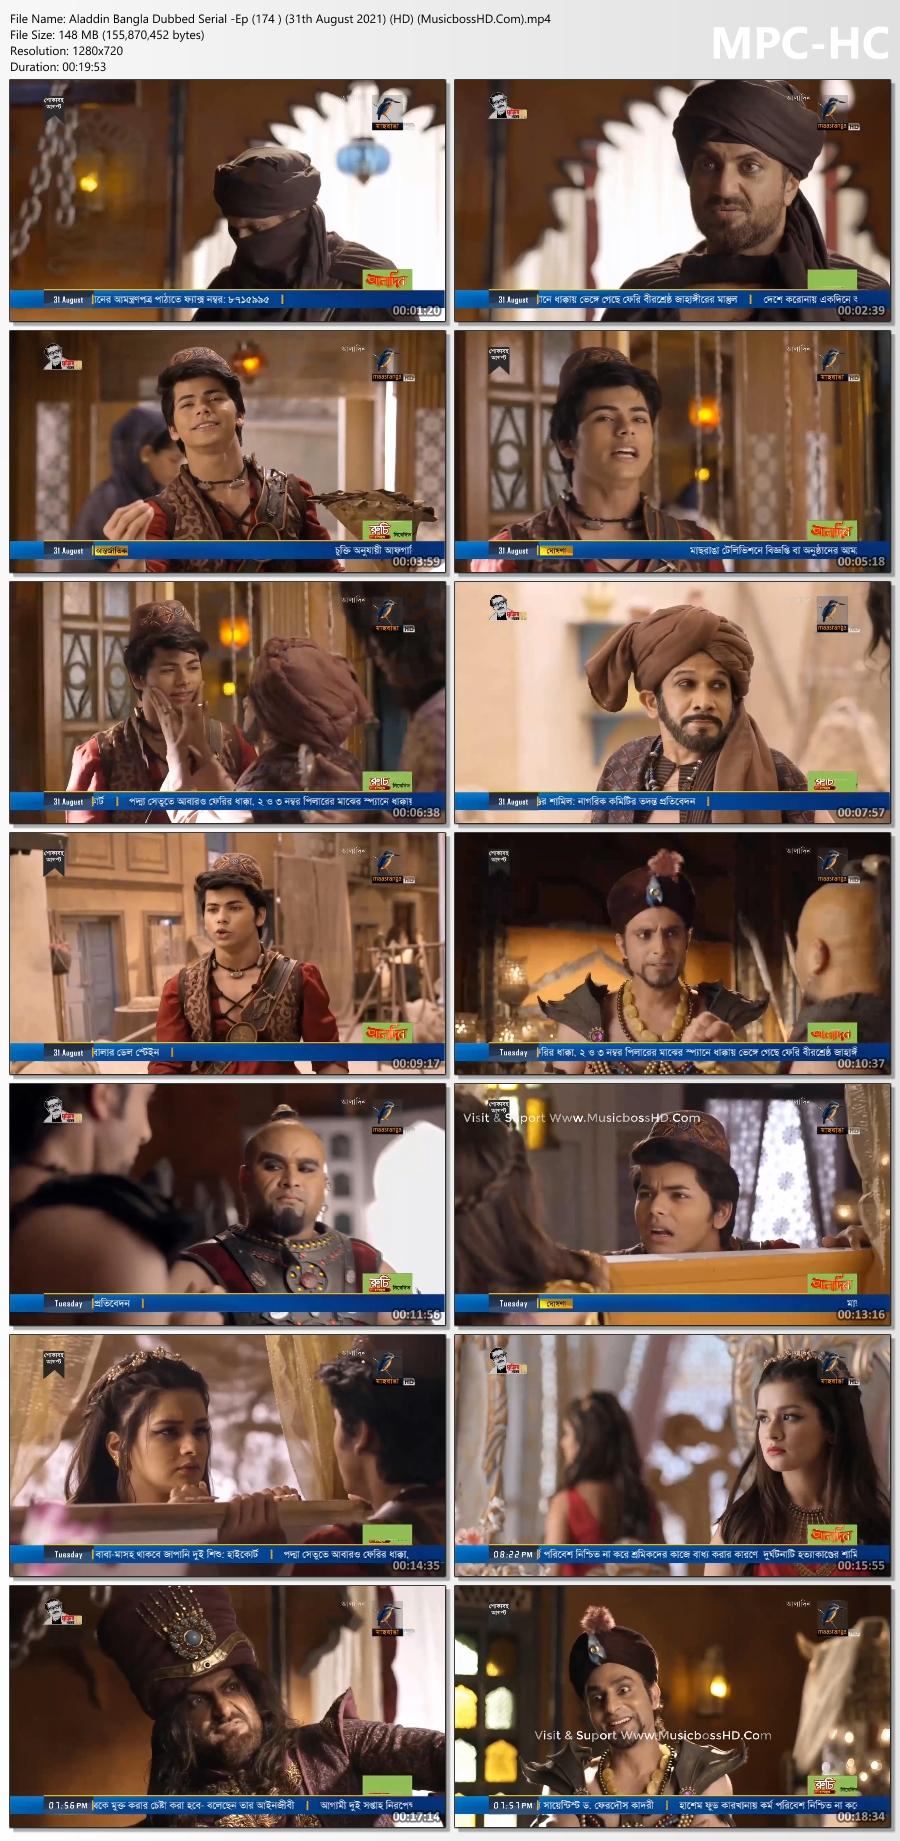 Aladdin-Bangla-Dubbed-Serial-Ep-174-31th-August-2021-HD-Musicboss-HD-Com-mp4-thumbs